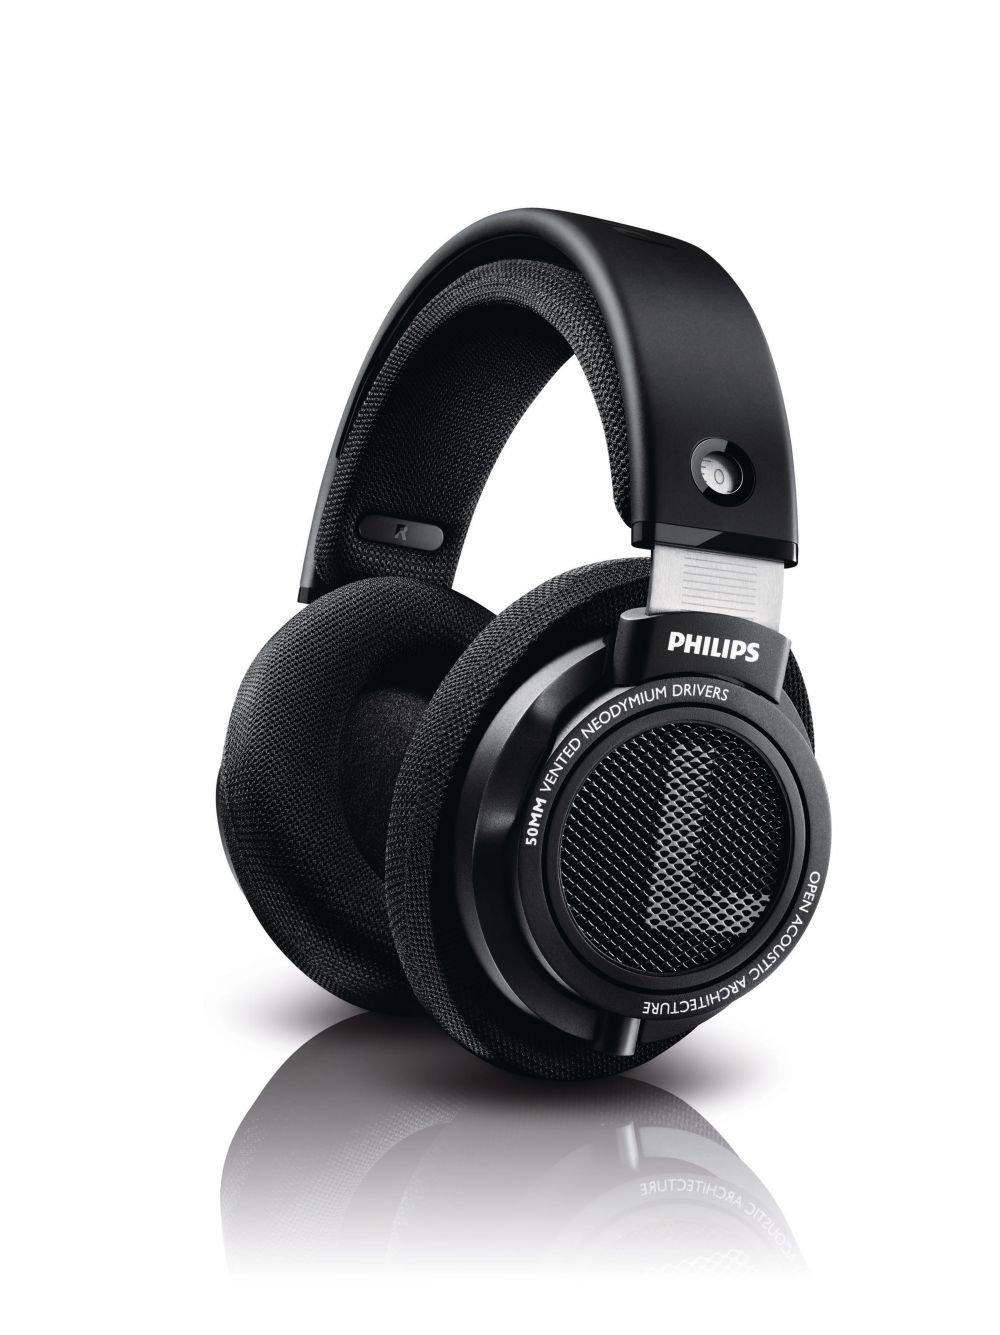 Philips SHP9500 HiFi Precision Stereo Over-ear Headphones